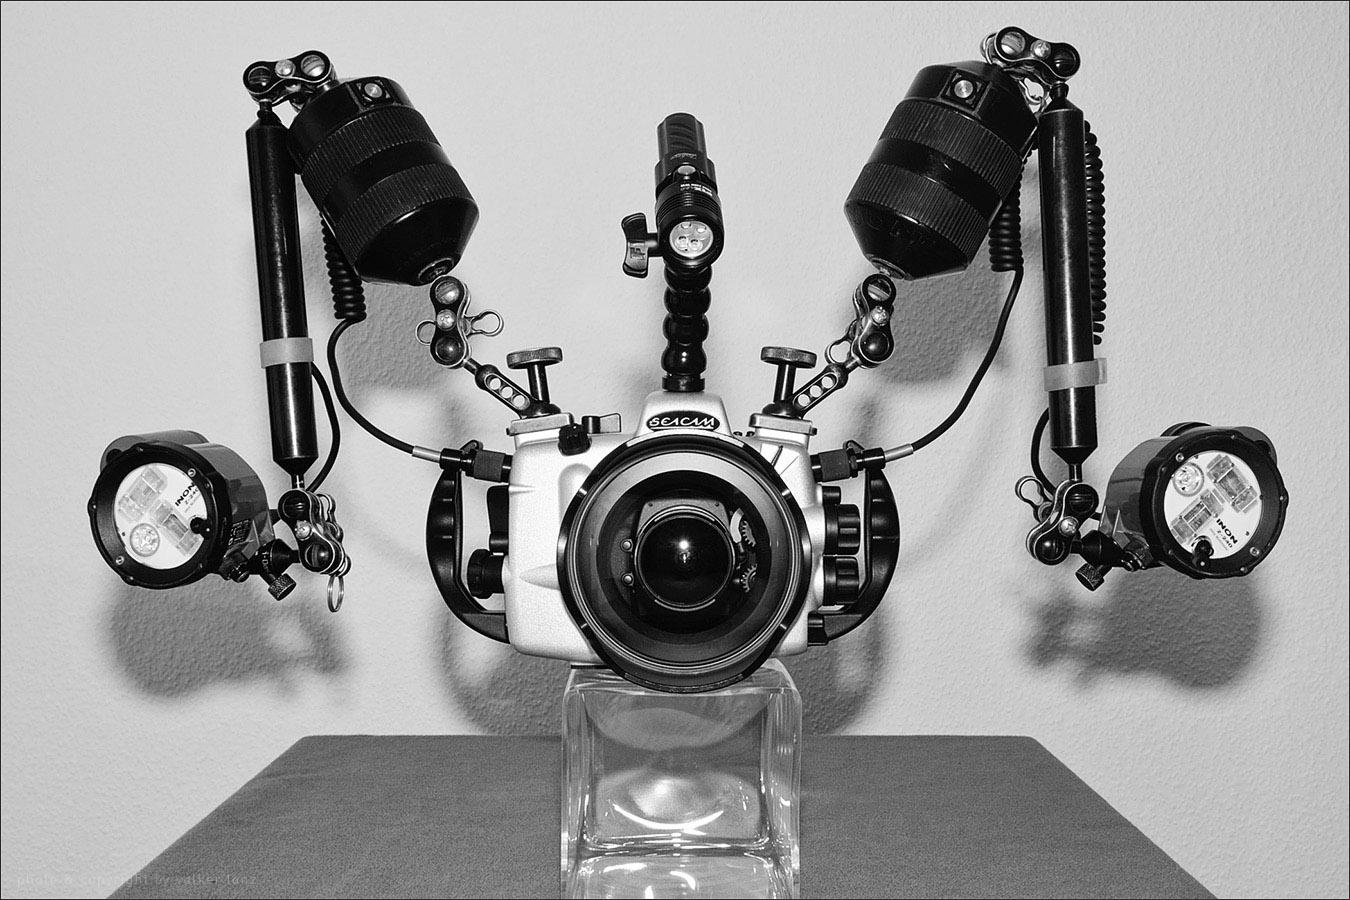 | setup | wideangle | front  | lens 10.5, 20, 12-24 | wideangle port | inon z240 strobe | fix neo 1000 focuslight